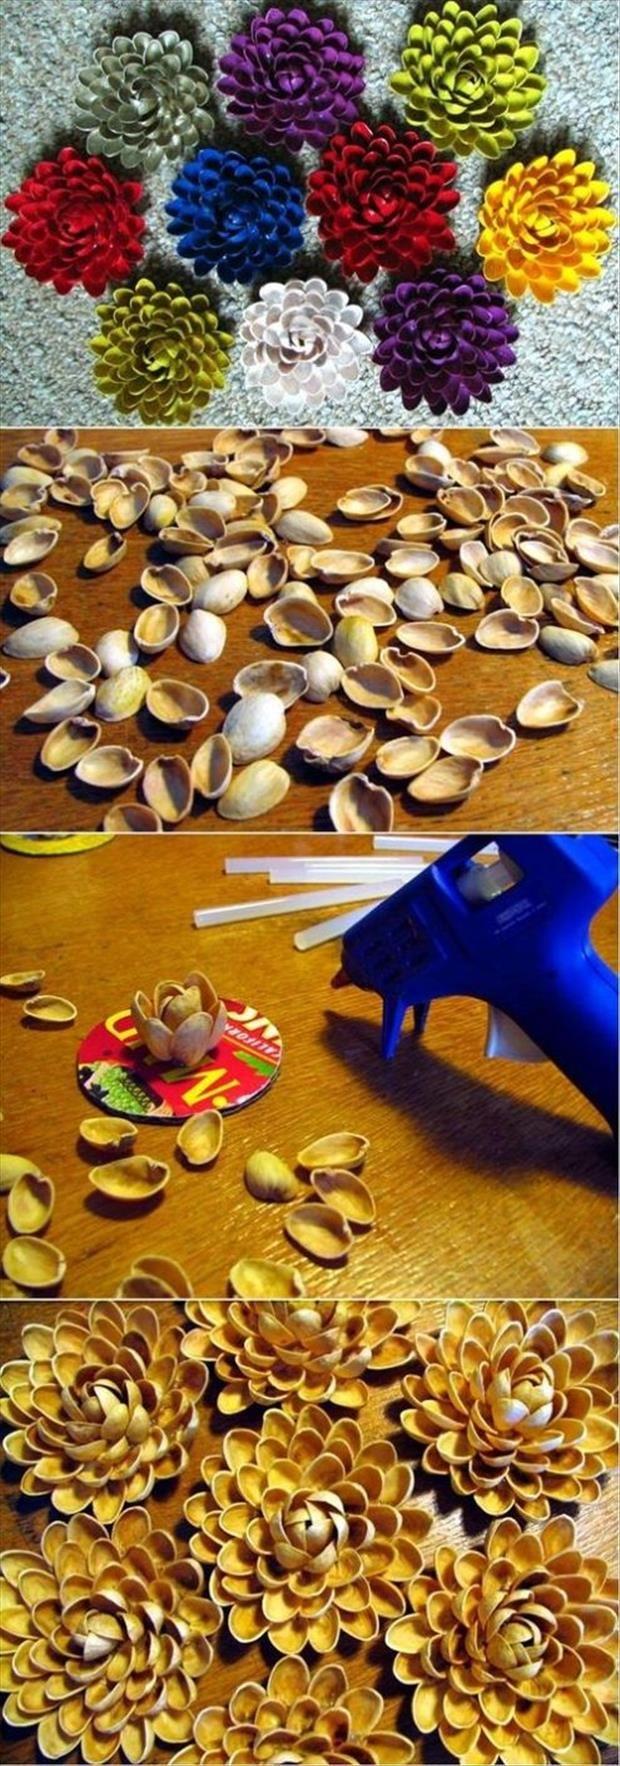 do it yourself craft ideas with glue gun